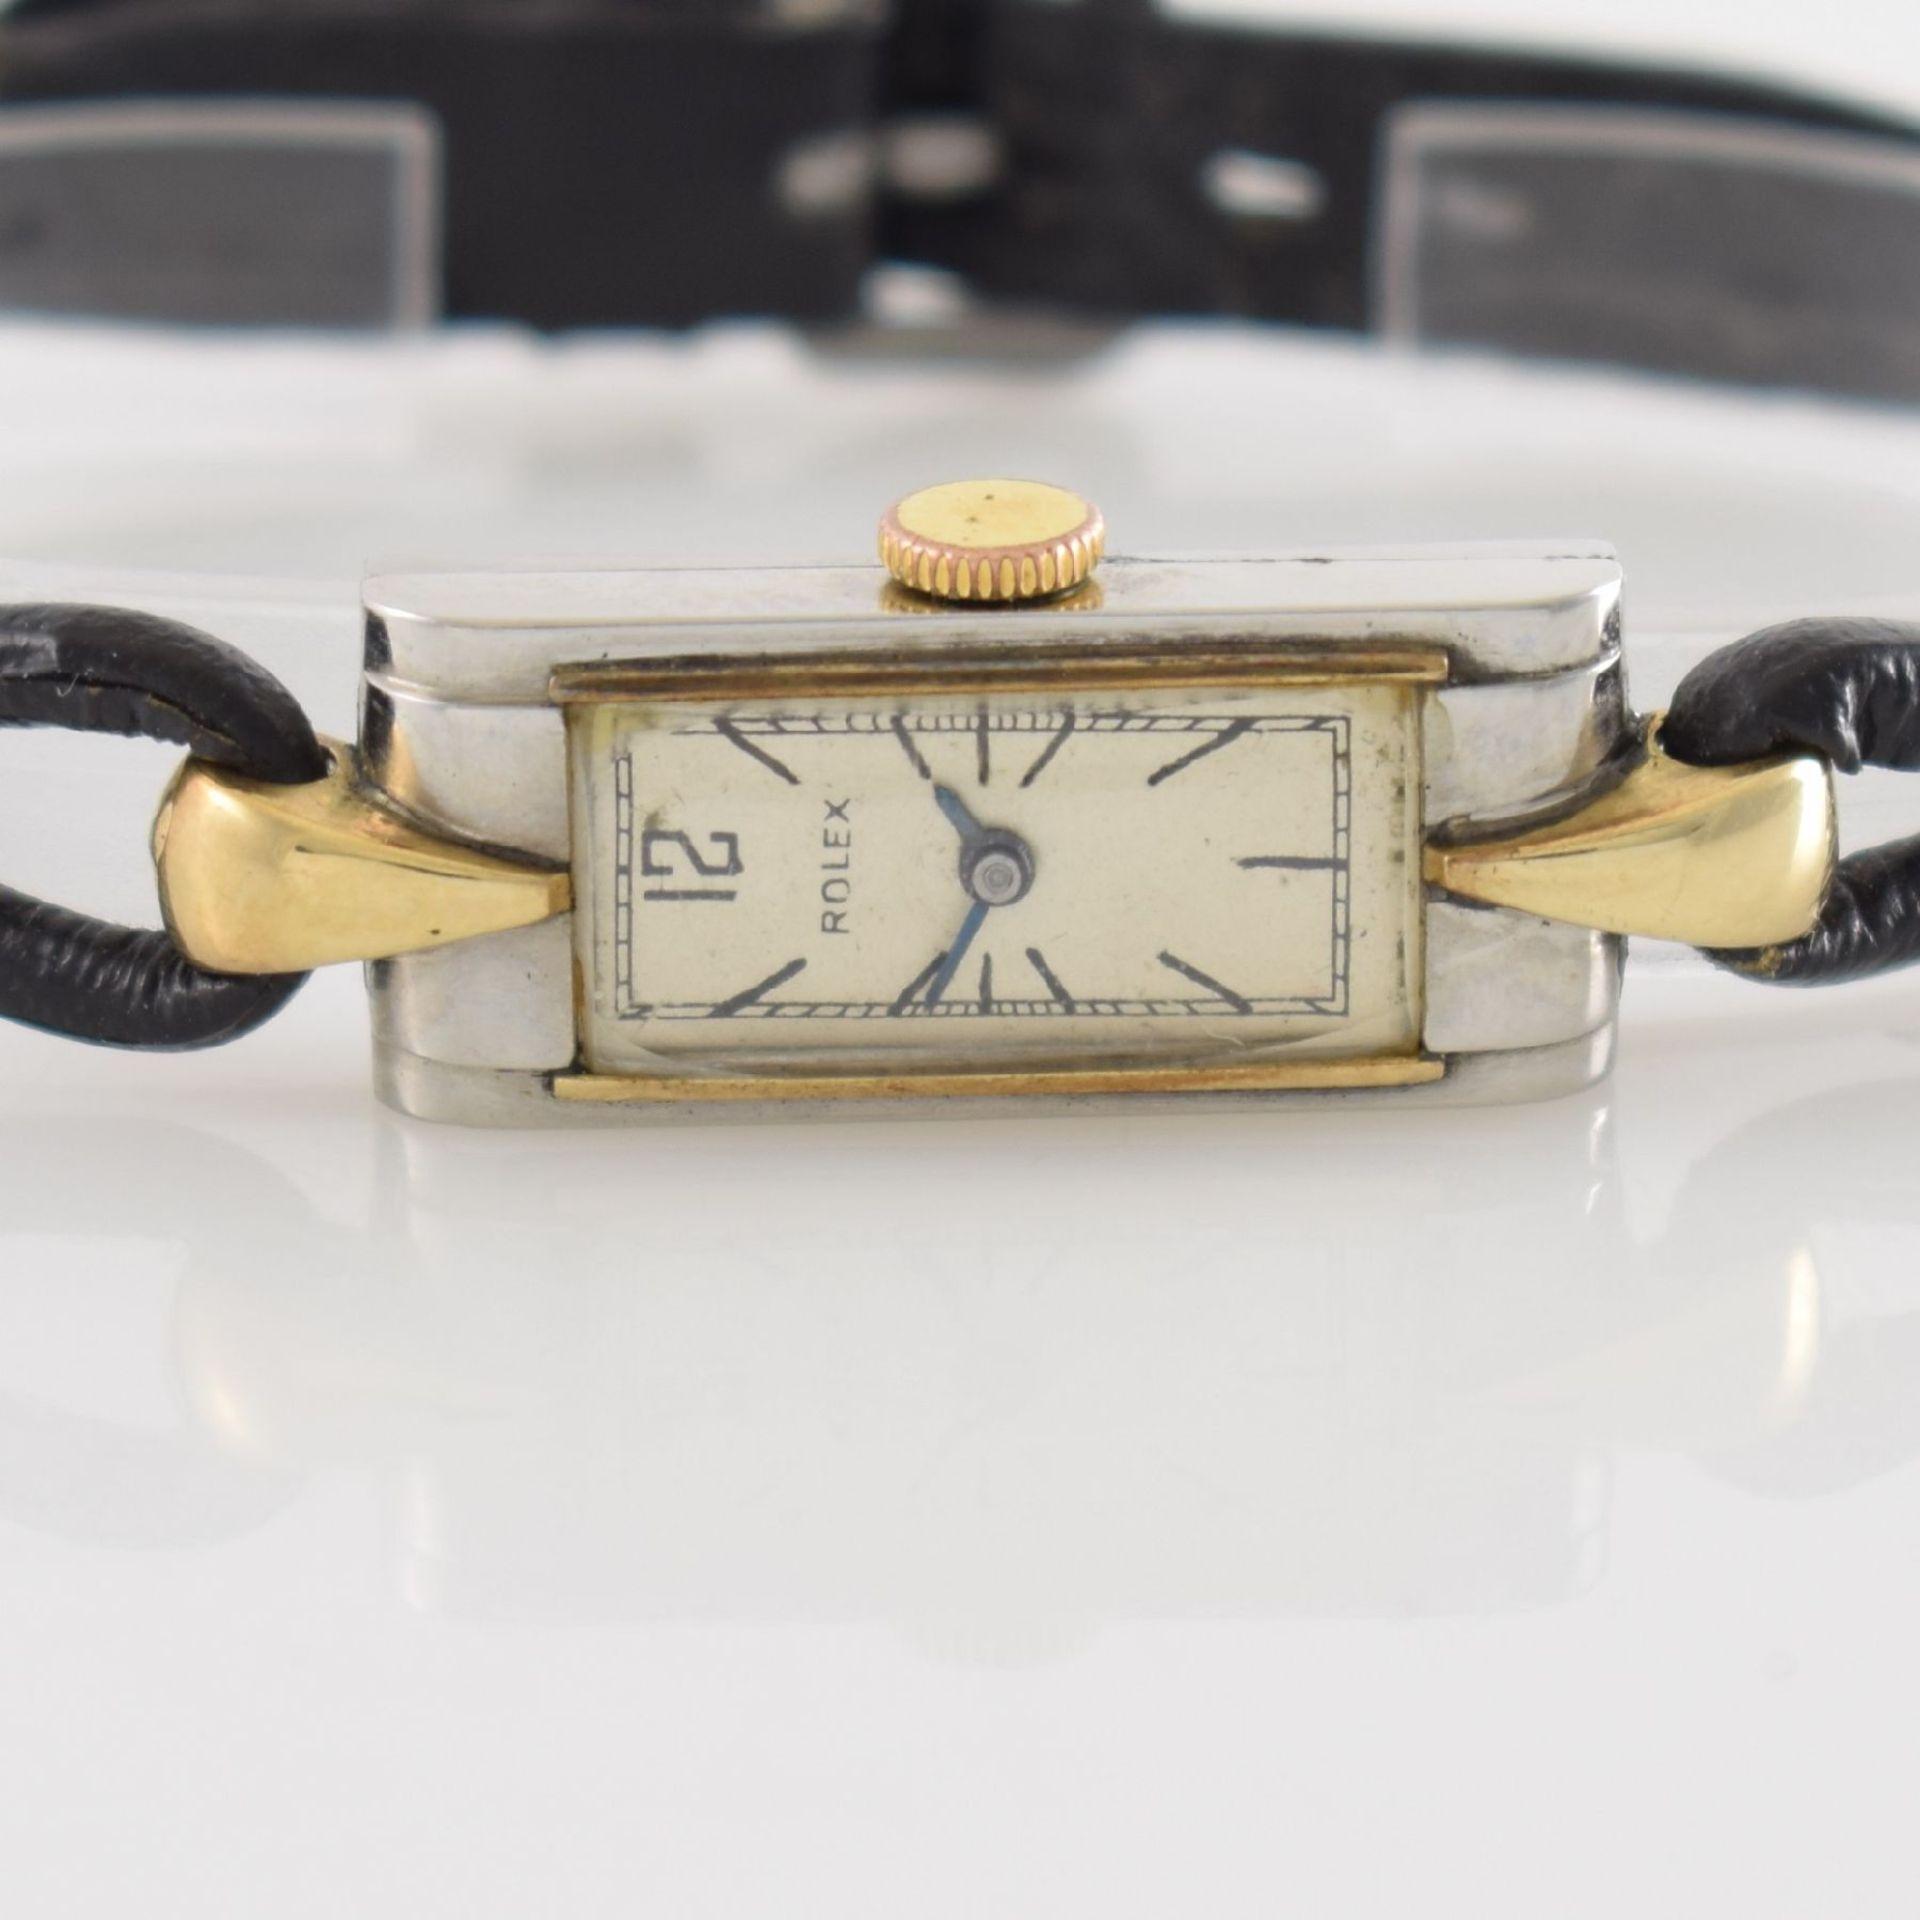 ROLEX Princess Damenarmbanduhr Ref. 1876 in Stahl/Gold, Schweiz um 1935, Handaufzug, rechteck. - Bild 2 aus 8